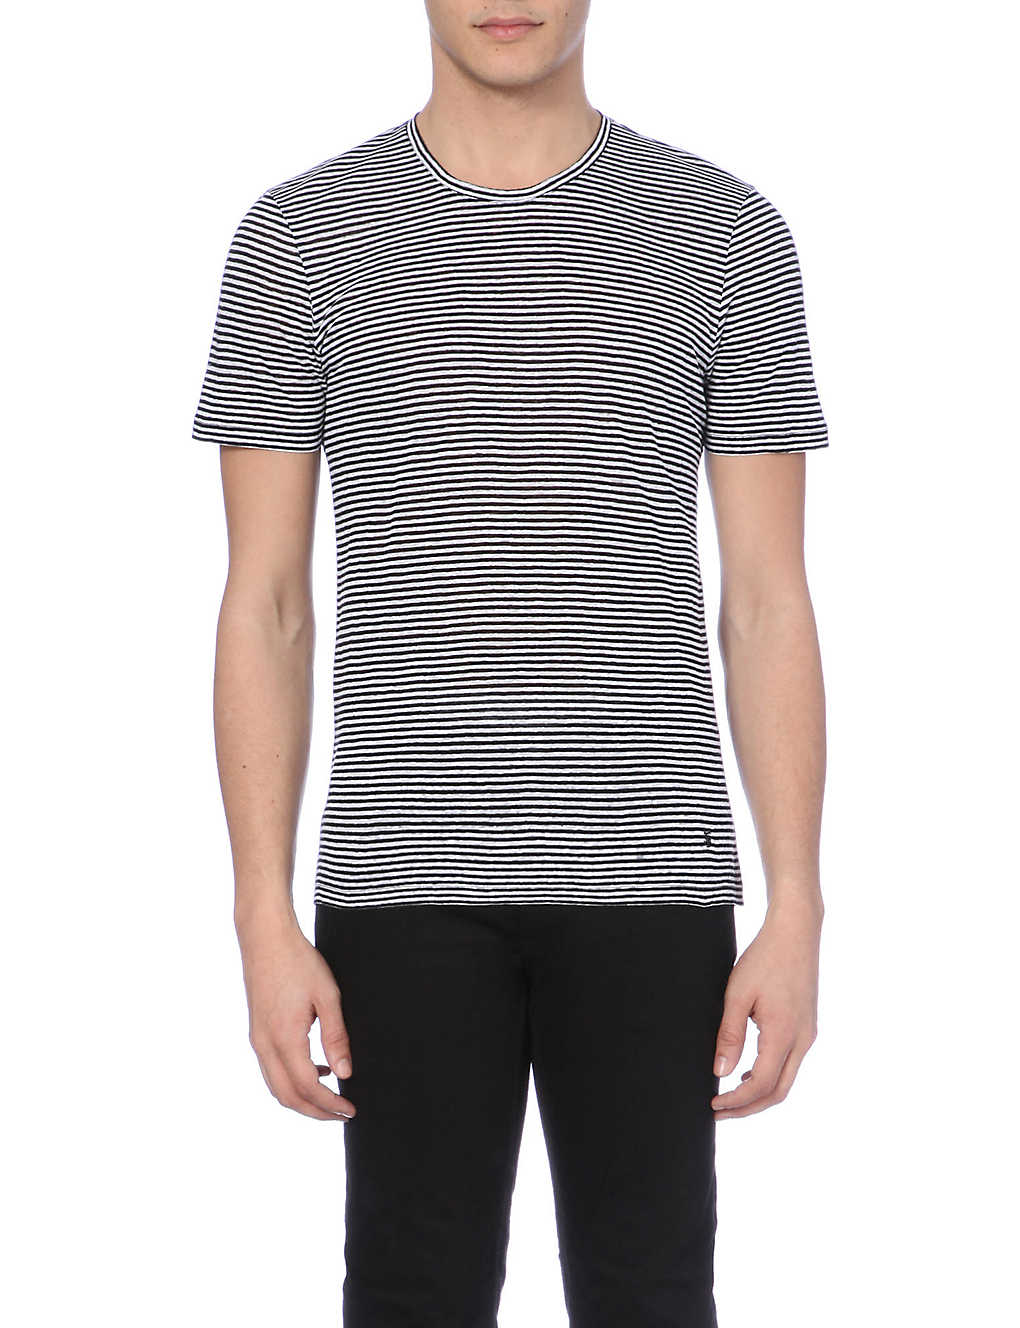 THE KOOPLES - Striped crew neck linen t-shirt | Selfridges com